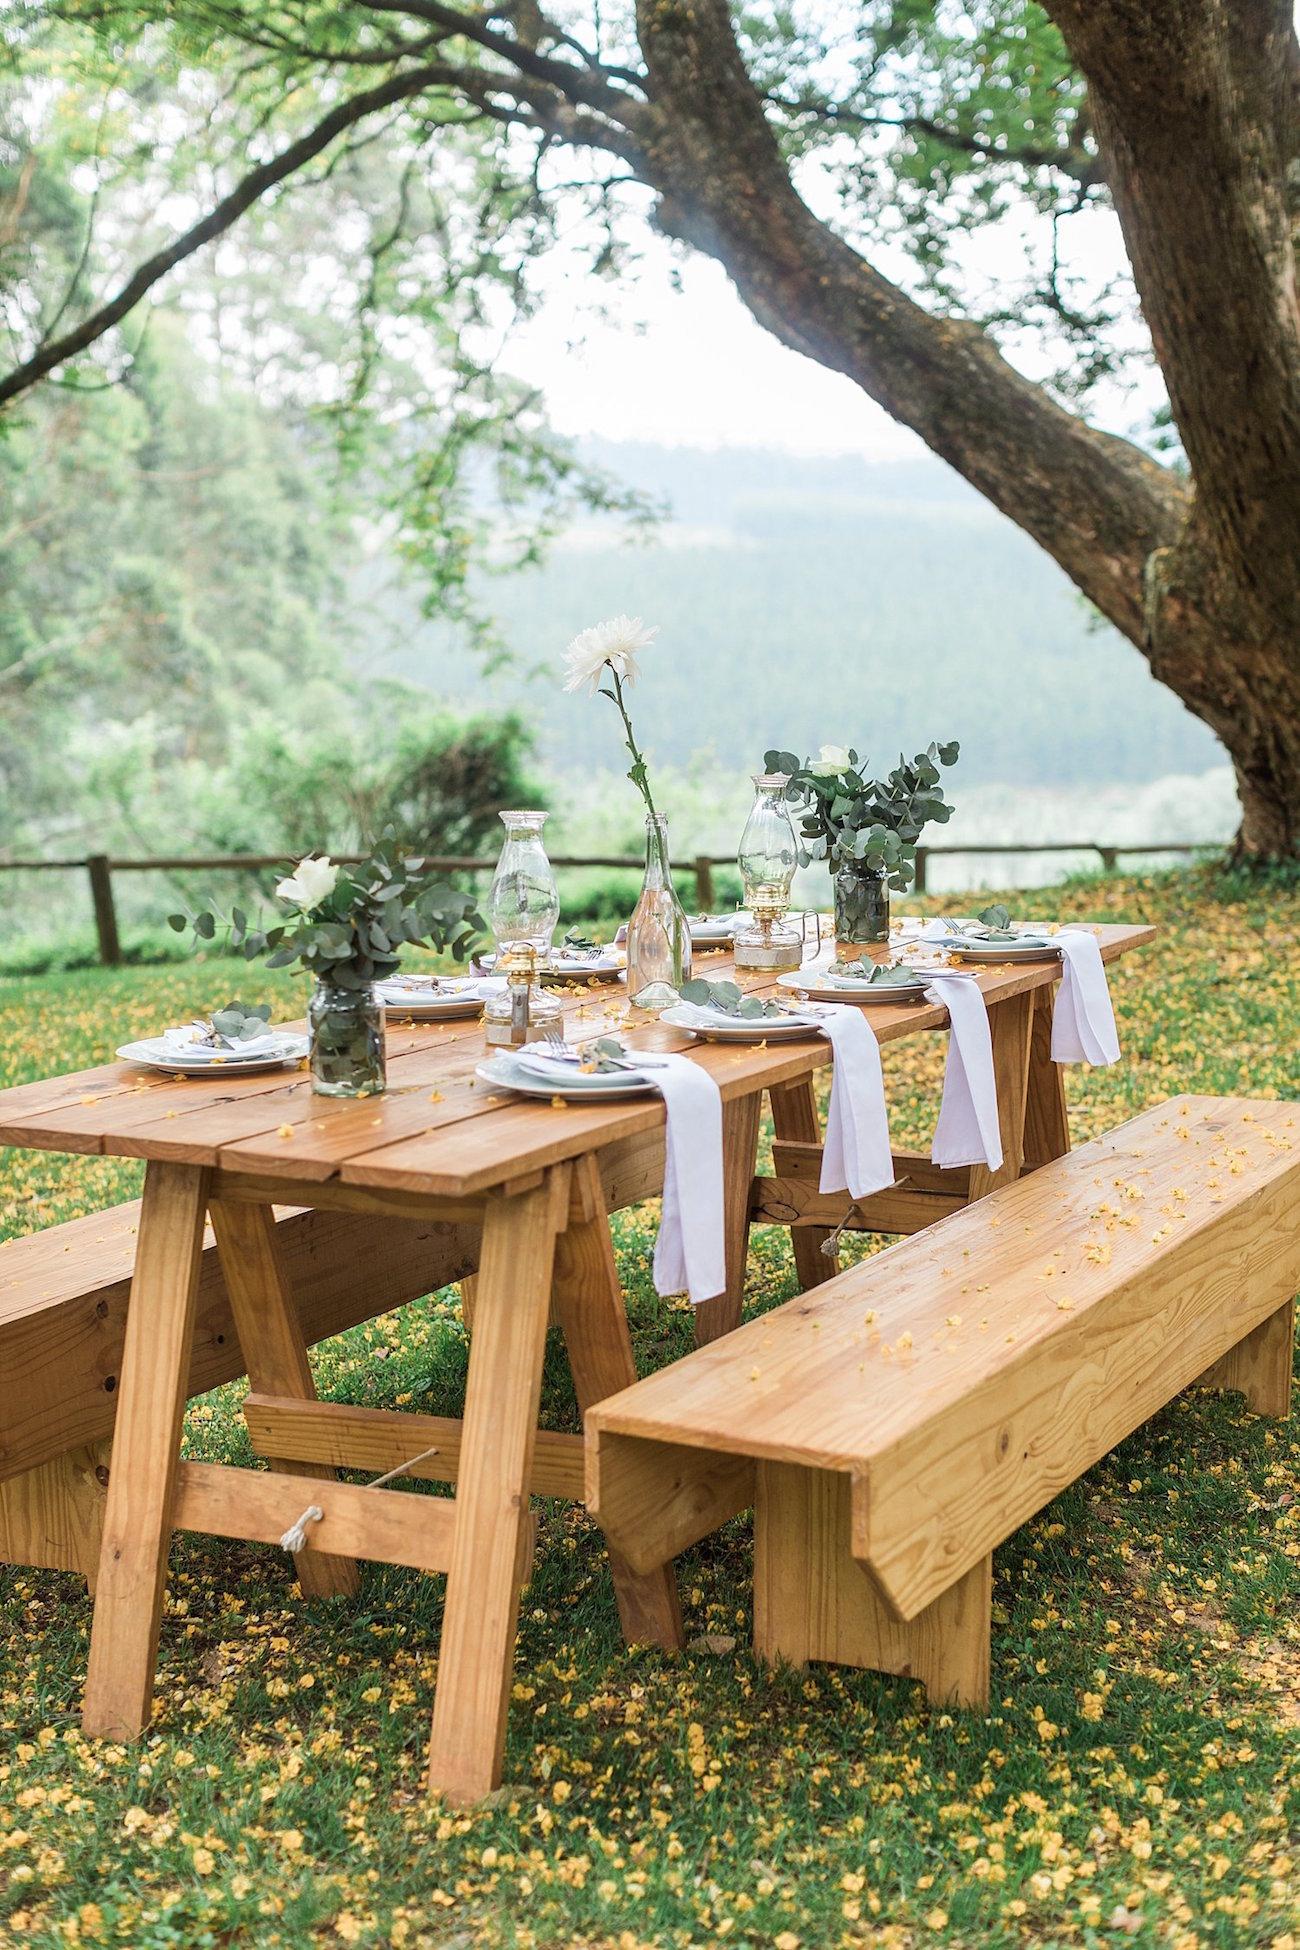 028-LA-Informal-Forest-Feast-Wedding-by-AliciaLandman.jpg